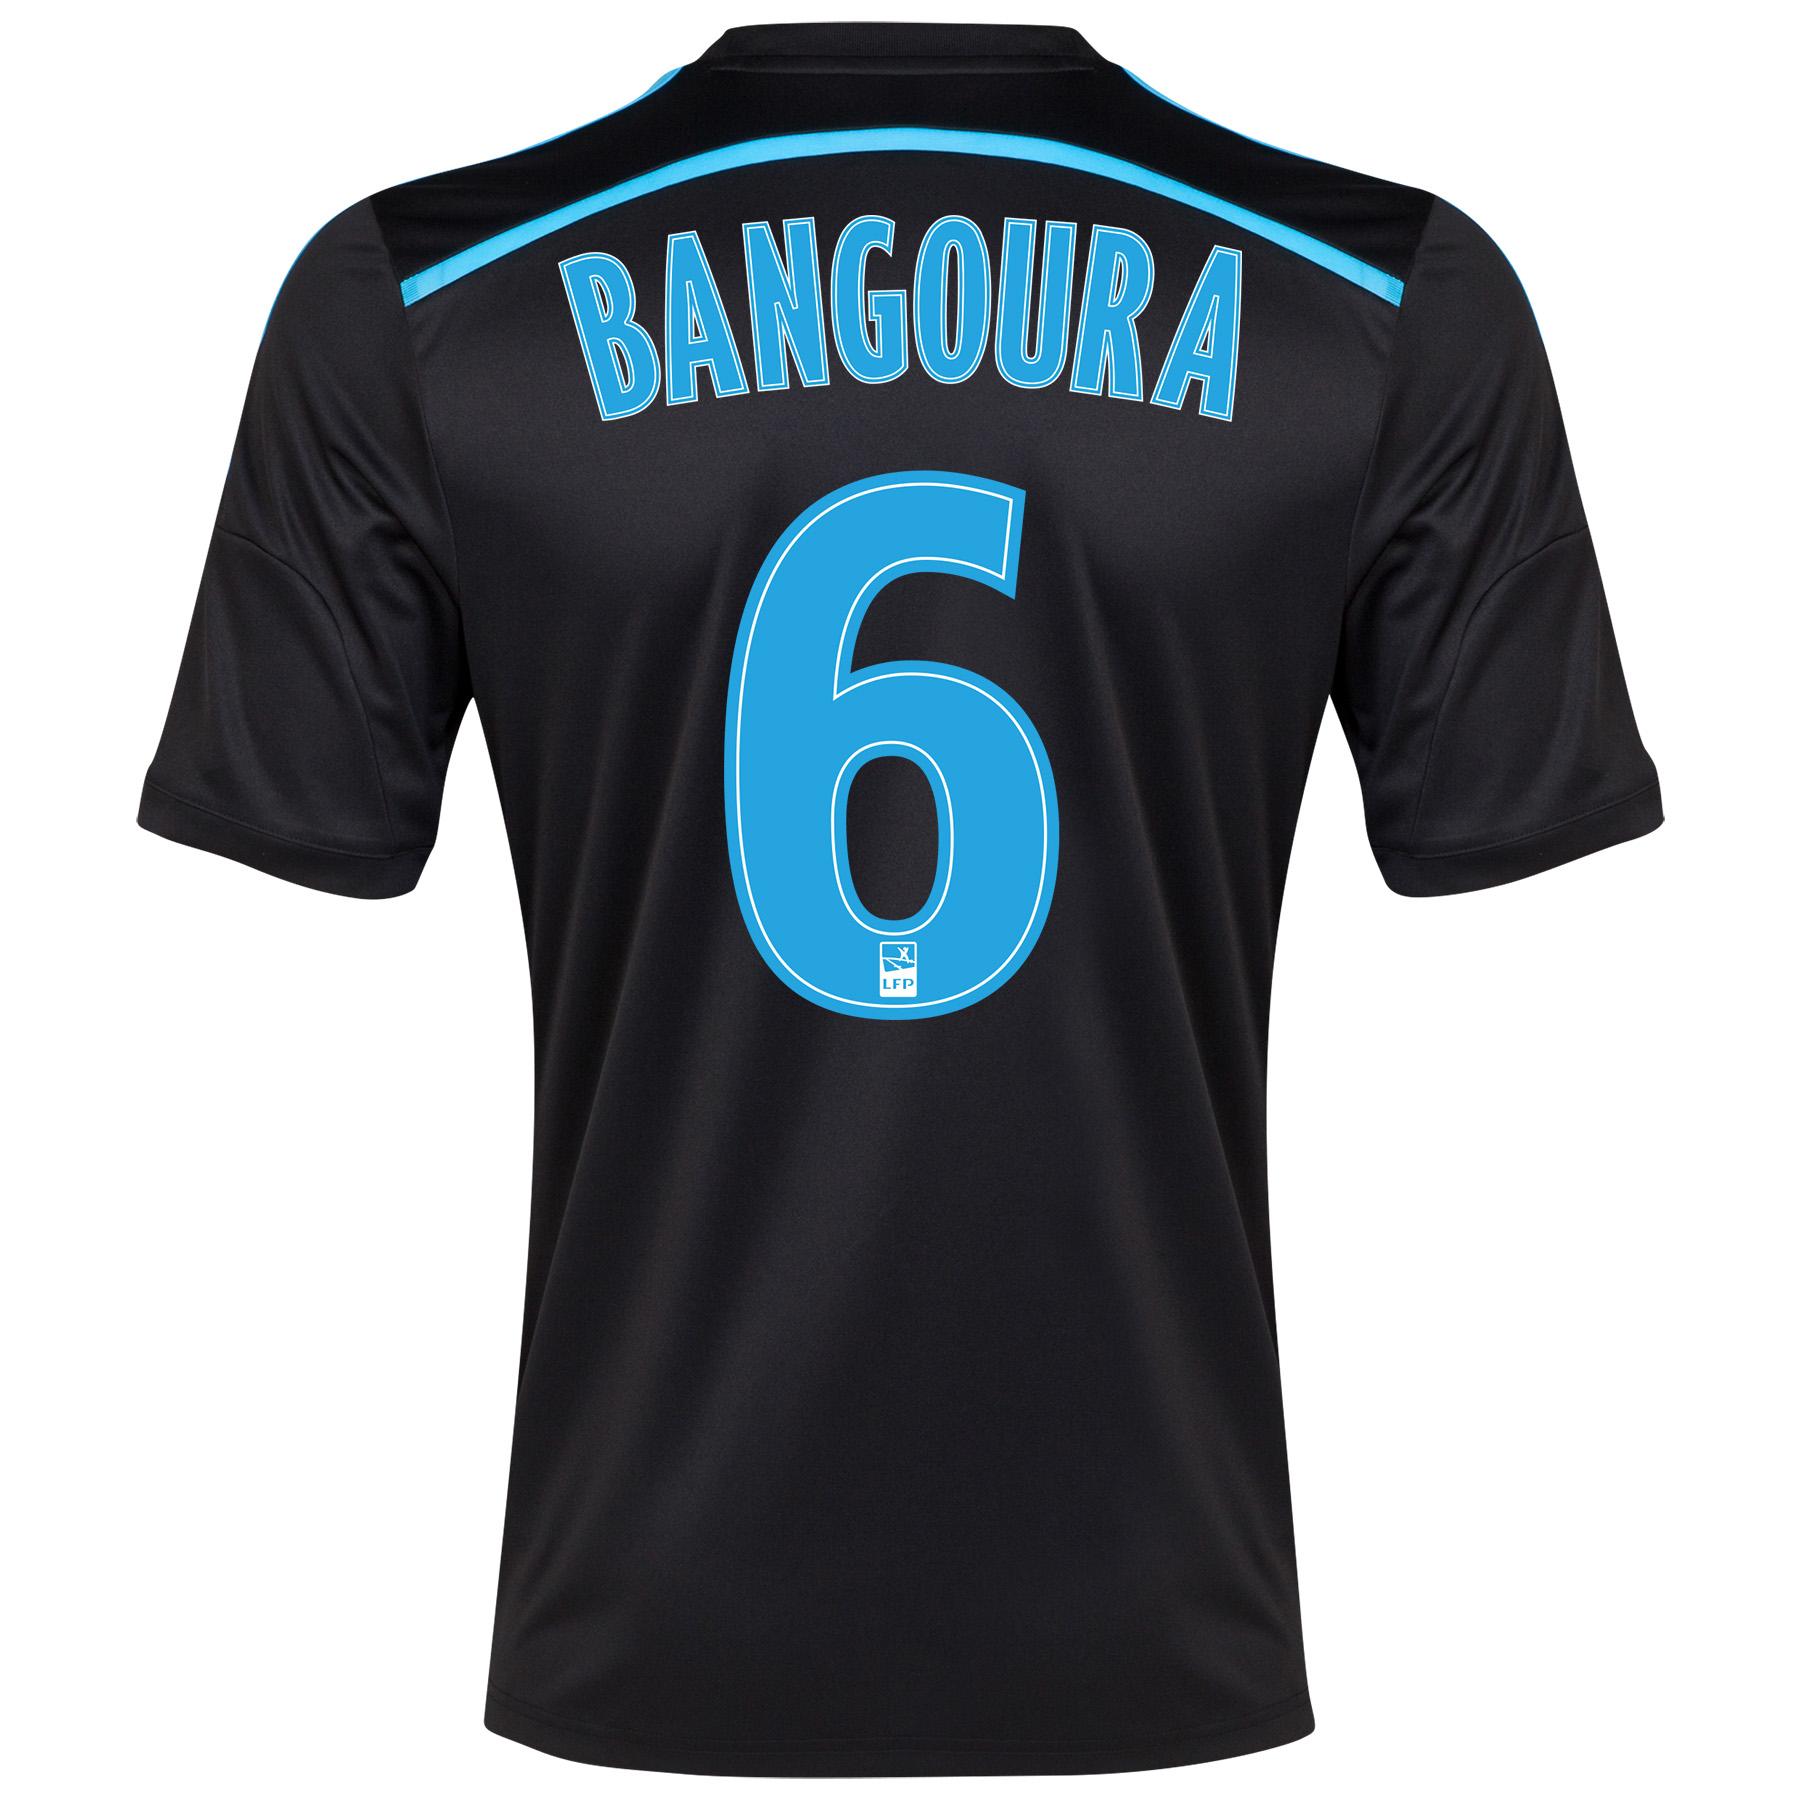 Olympique de Marseille 3rd Shirt Short Sleeve 2014/15 Black with Bangoura 6 printing